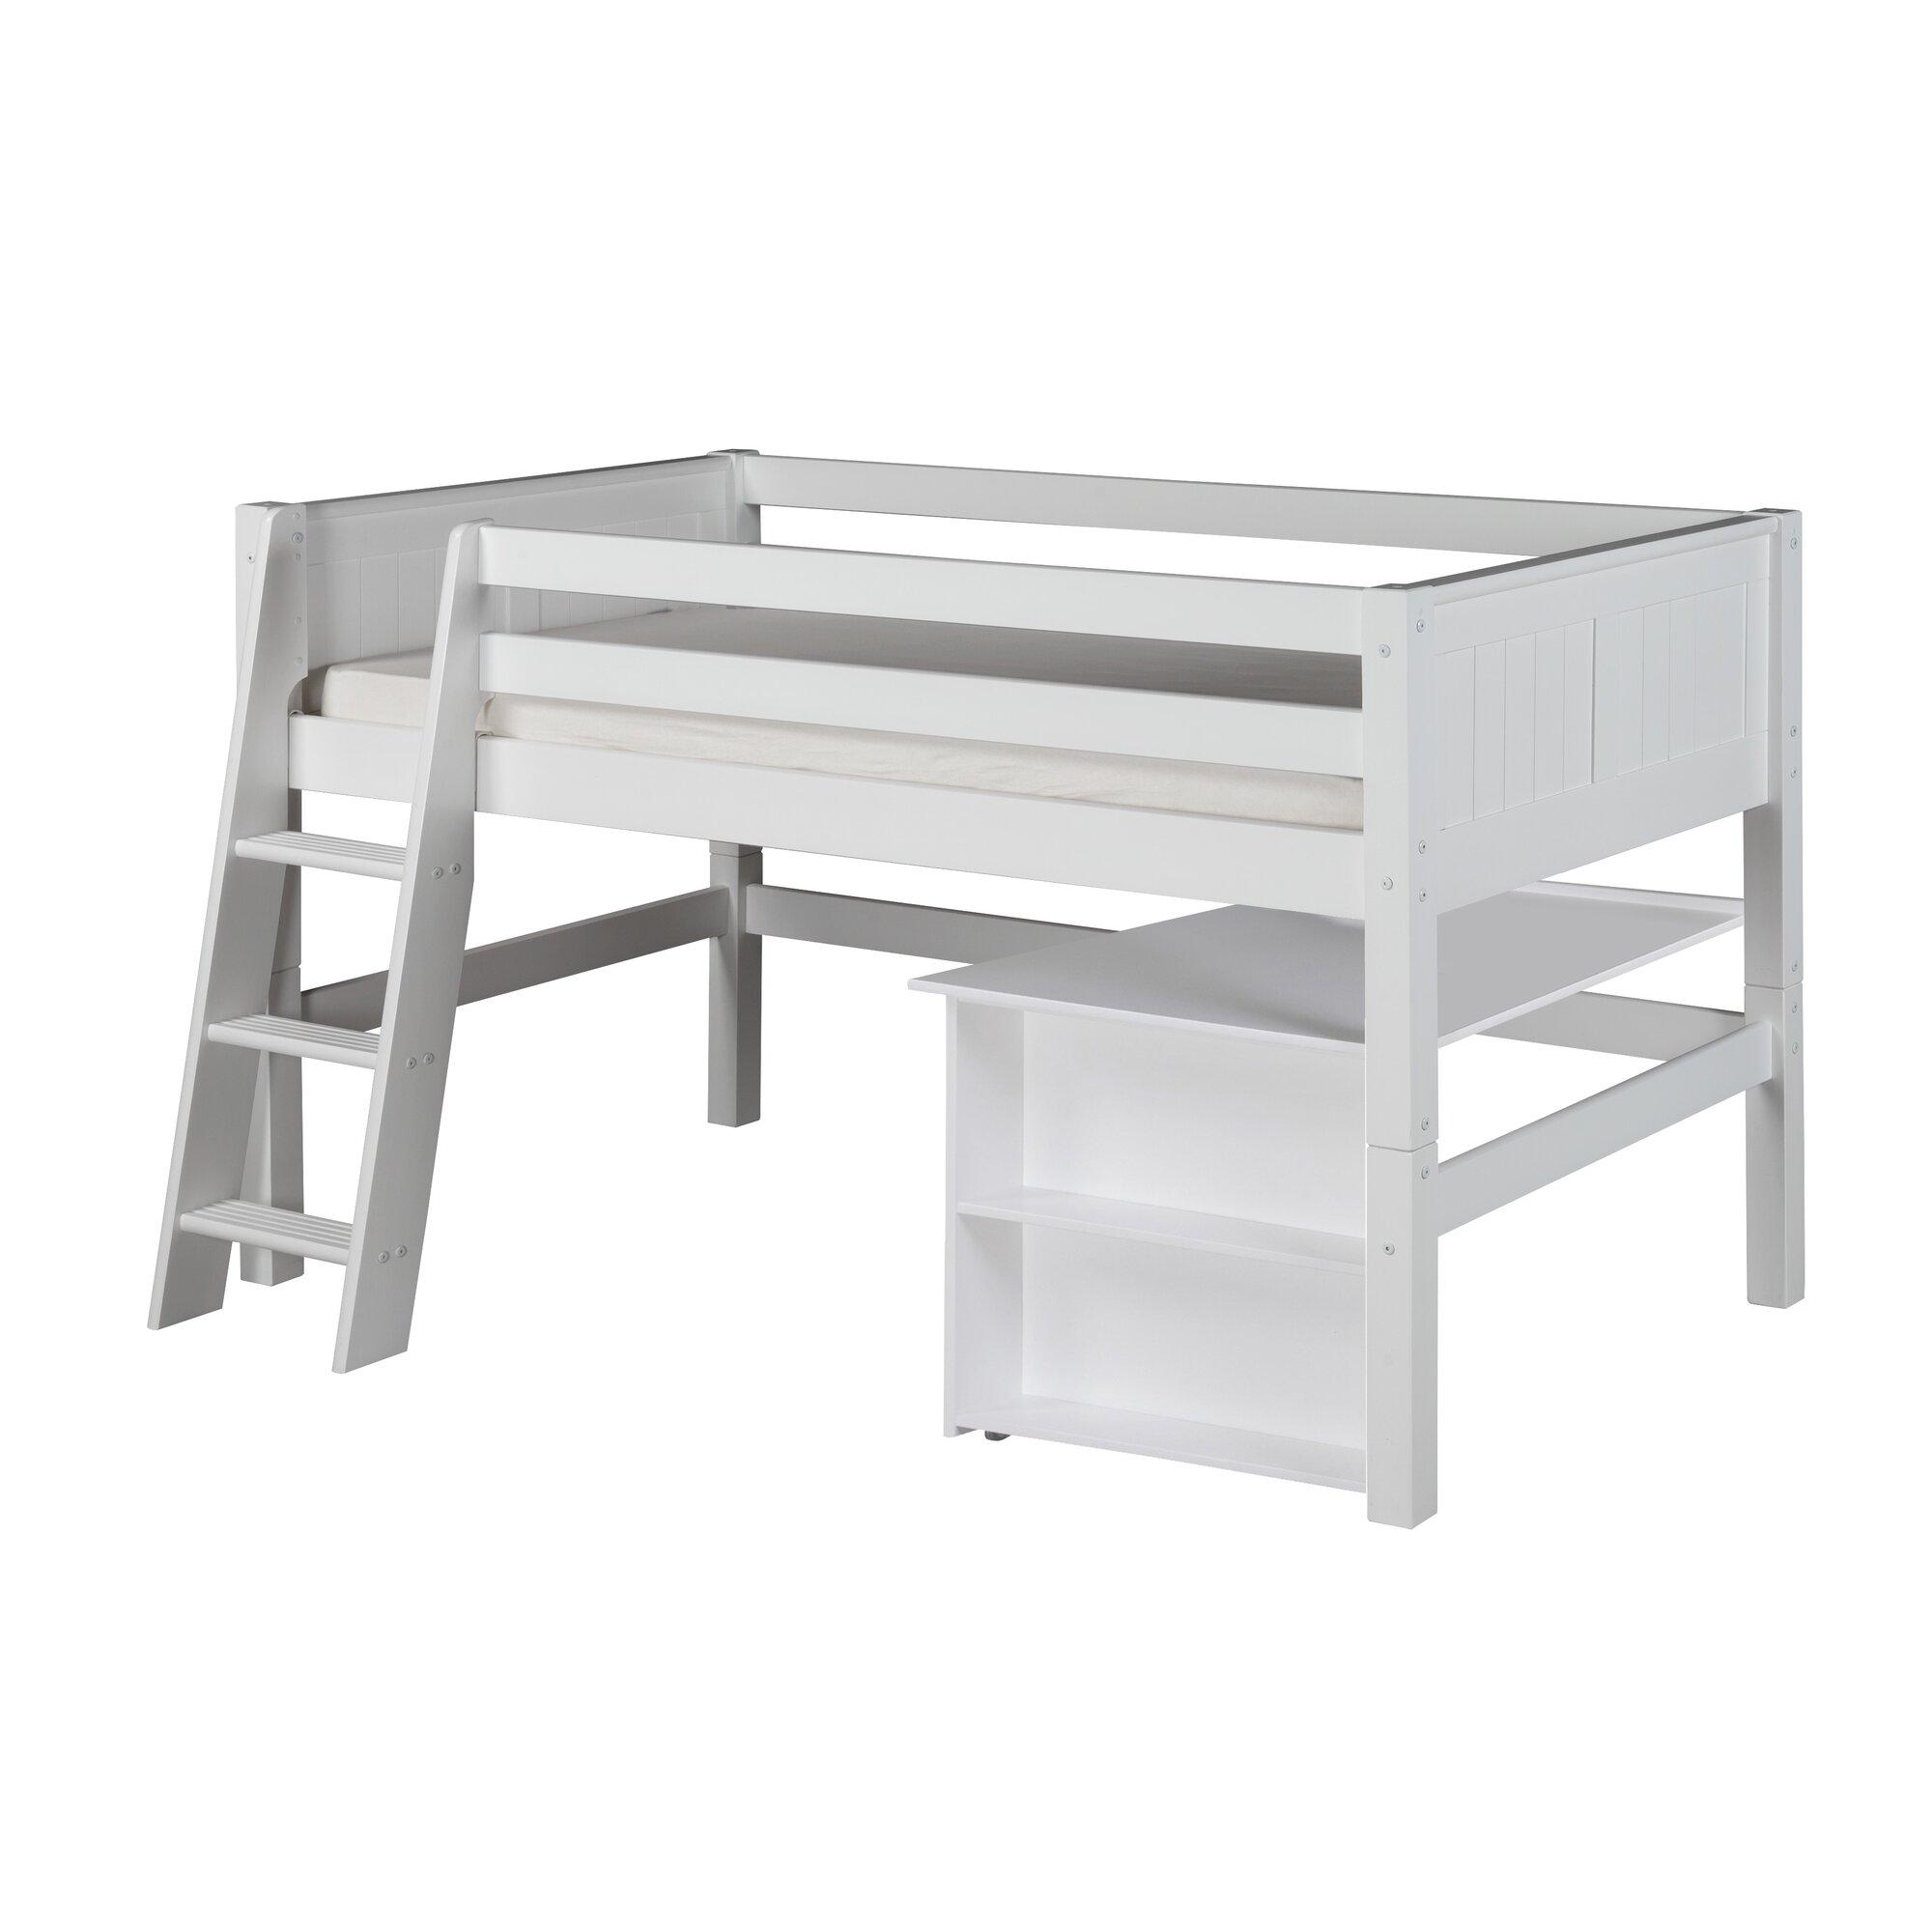 Camaflexi Camaflexi Twin Low Loft Bed Amp Reviews Wayfair